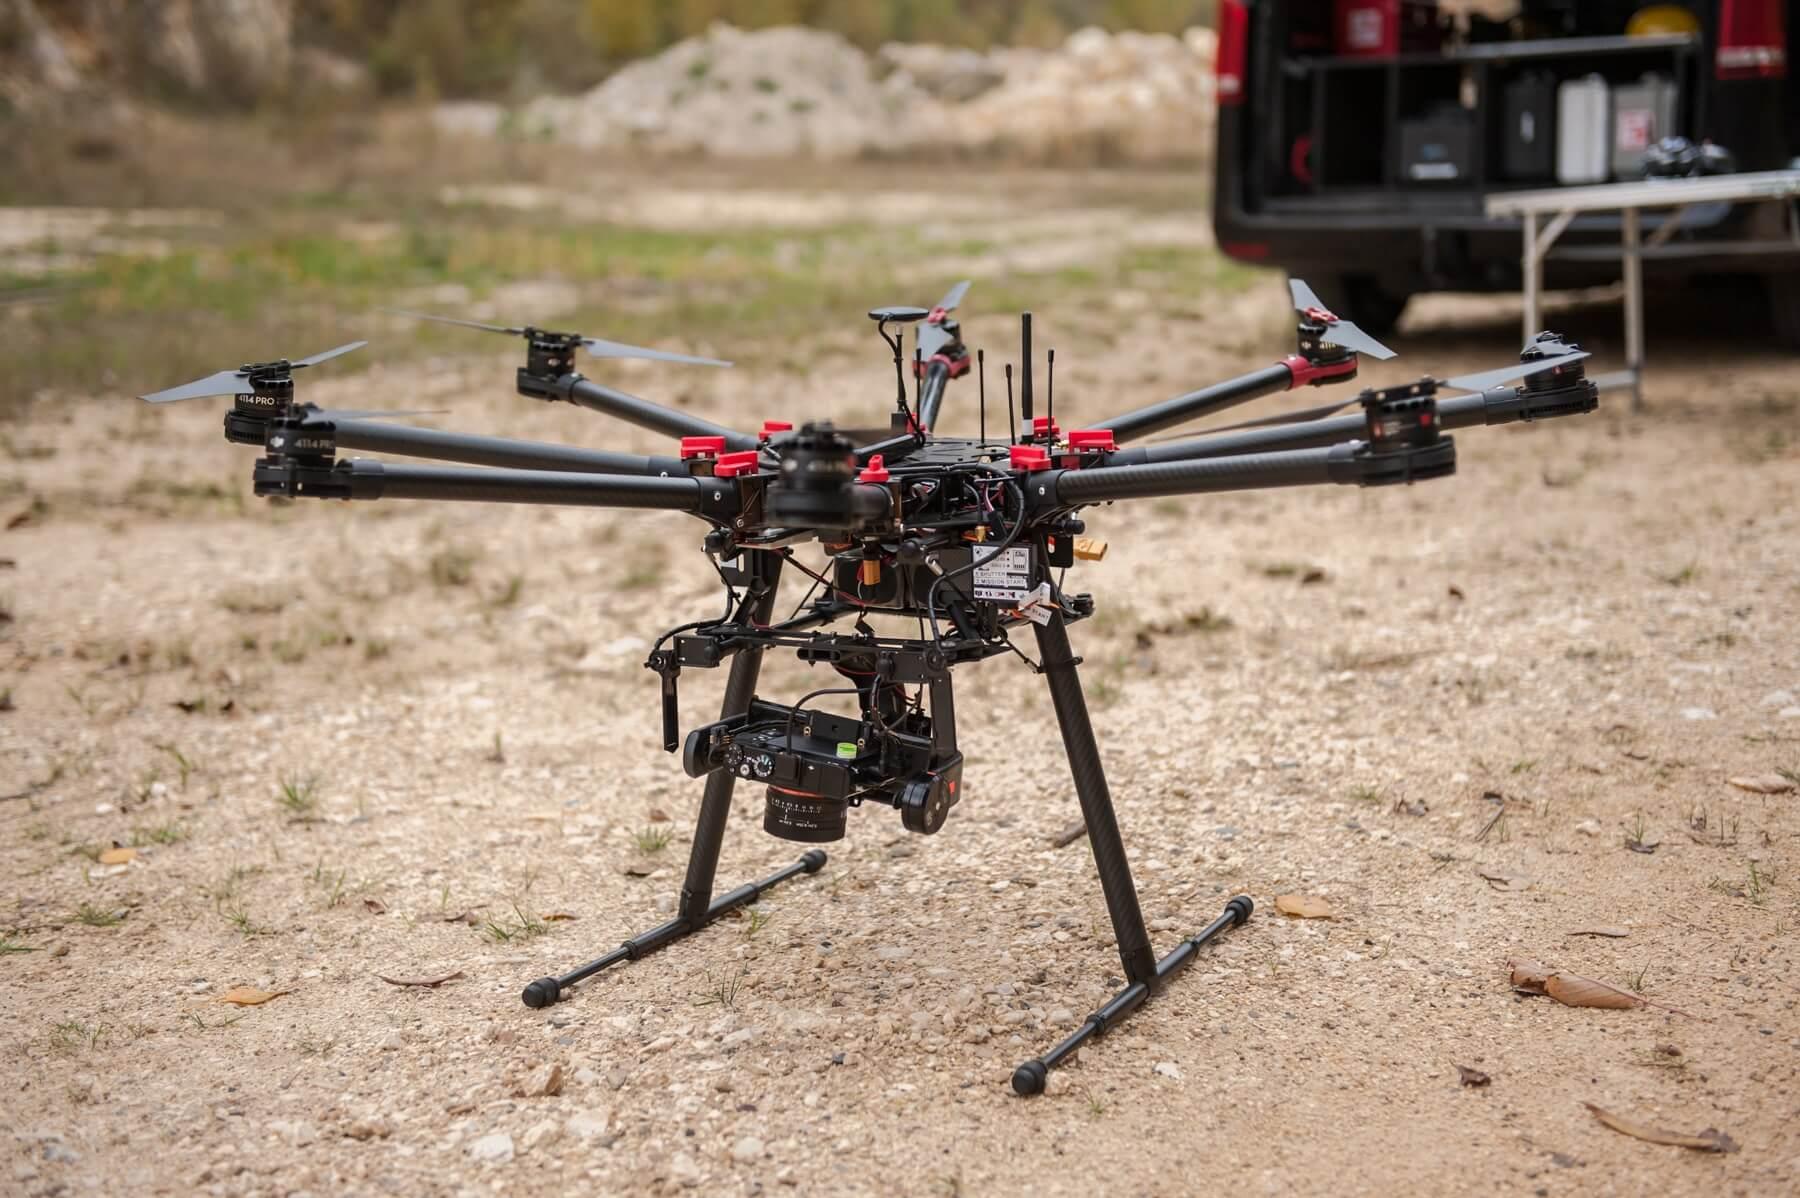 UAV-Photogrammetrie-Drohne-Scannerdrohne-mit-Foto-Sensor-Photogrammetrie-Service